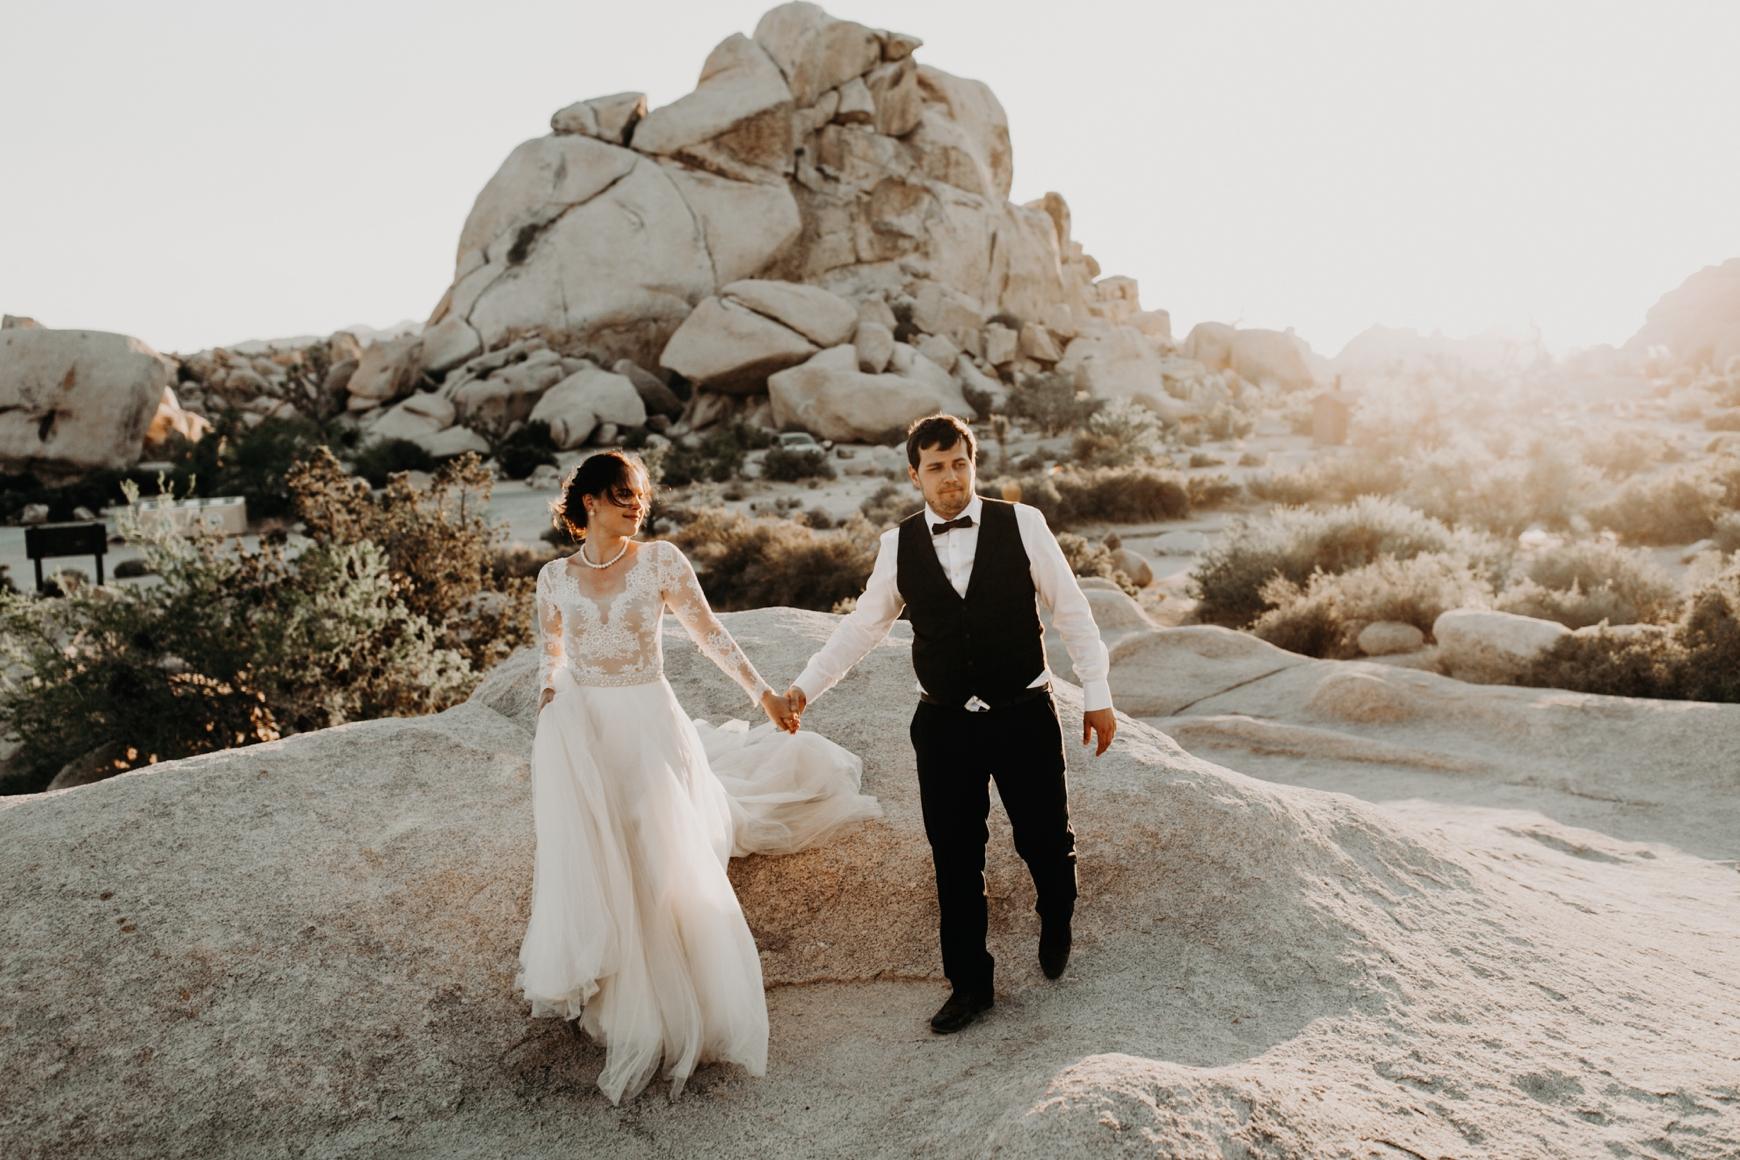 Joshua Tree Bridal Portraits Anastasia & Andrey Emily Magers Photography-263.jpg